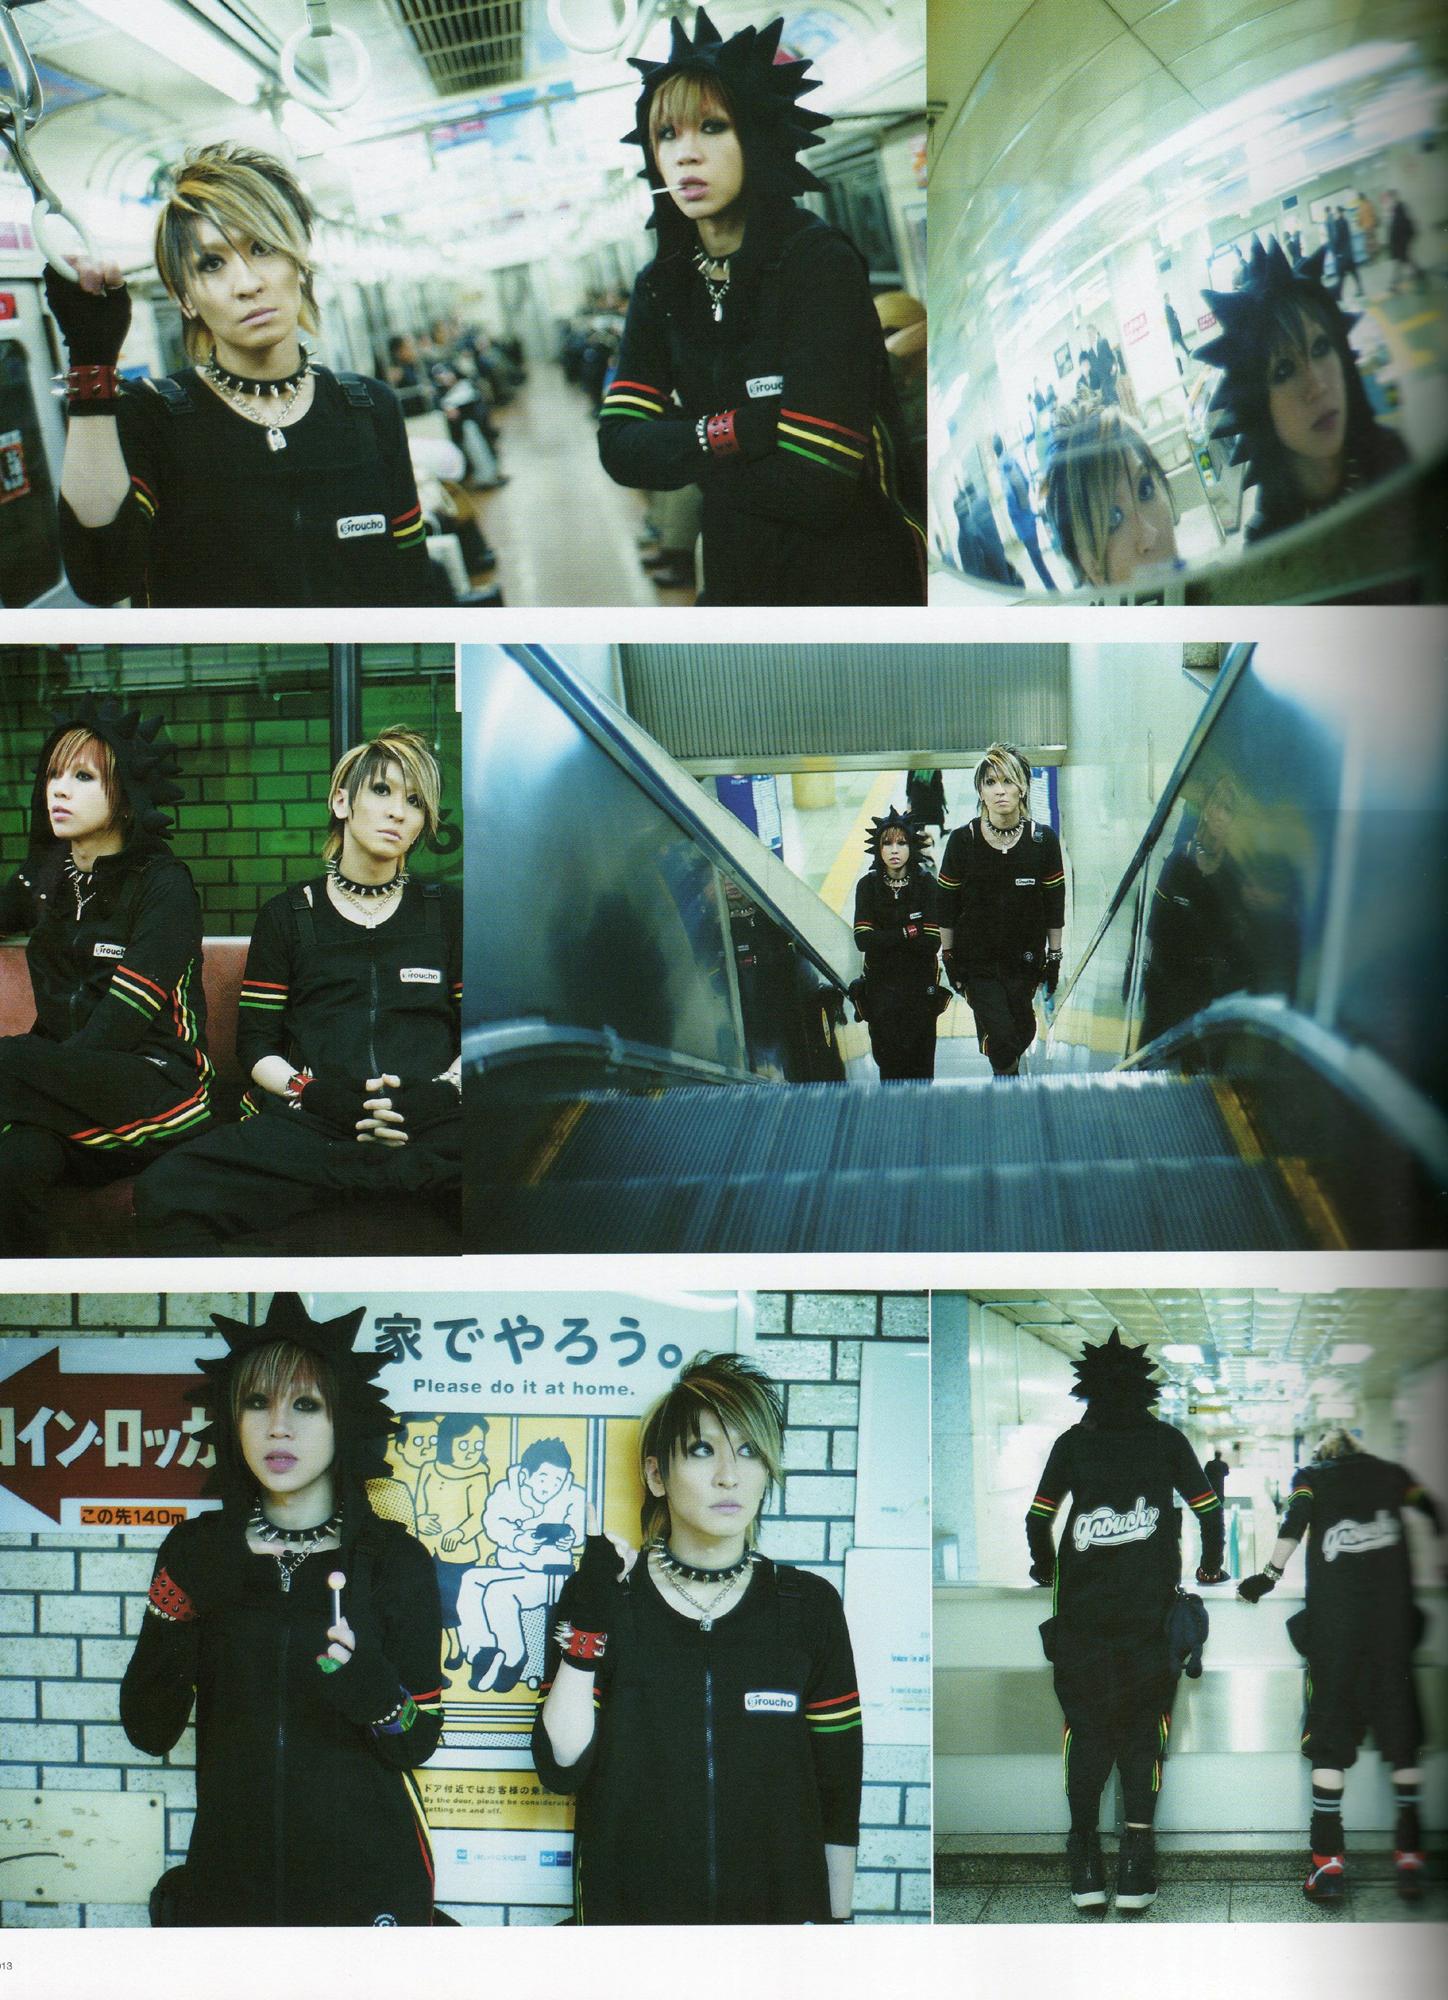 LM.C 6 by Ny-x